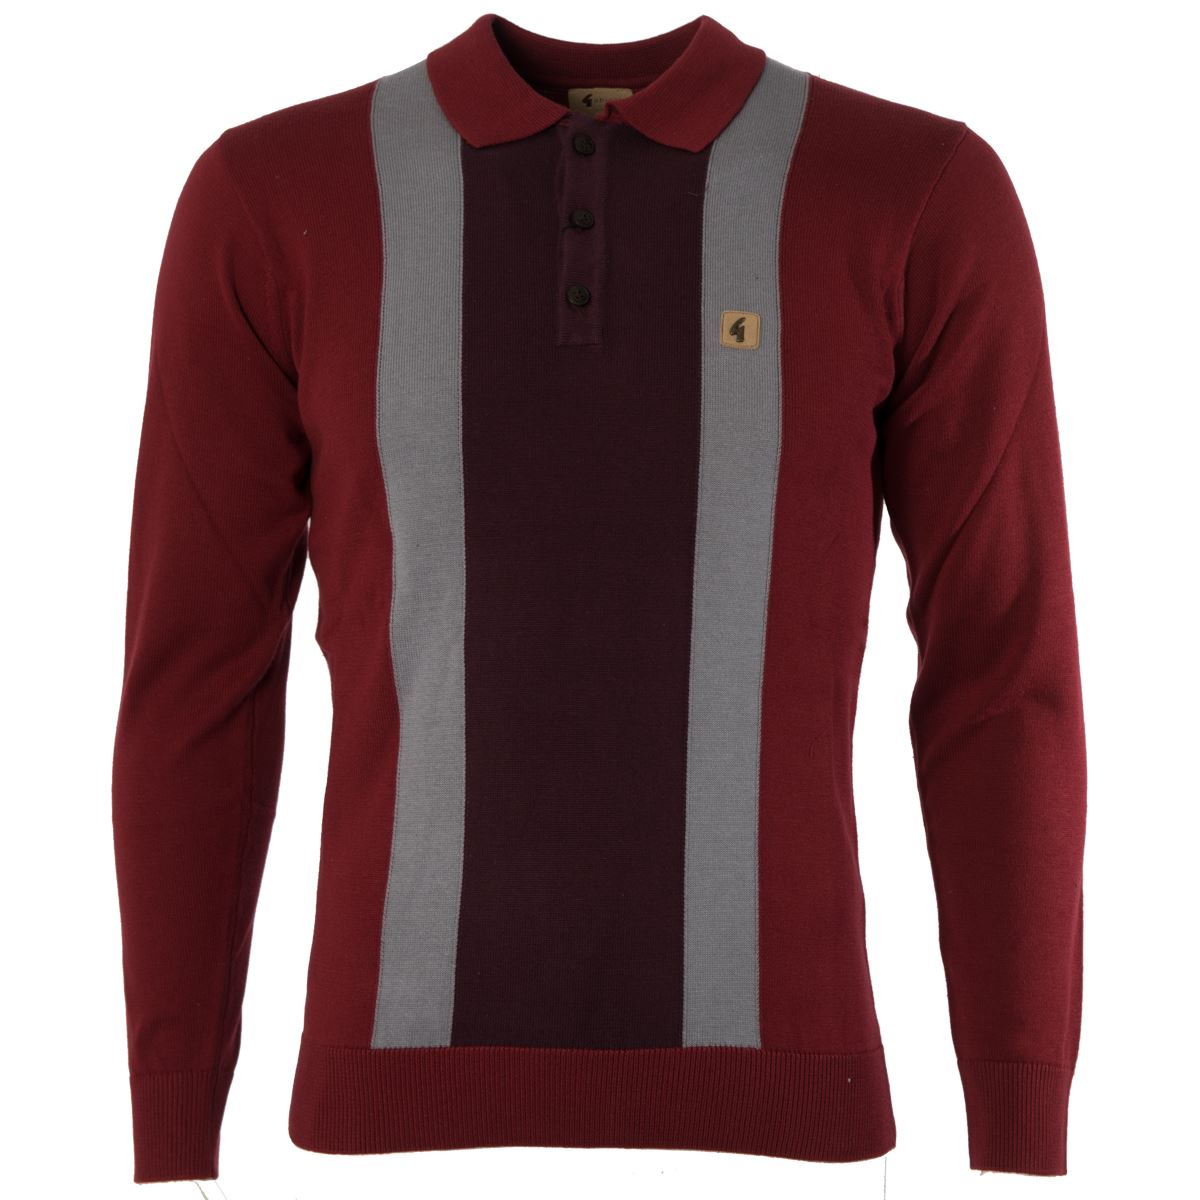 Gabicci vintage mens knitted polo shirt knitwear long for Knitted polo shirt mens